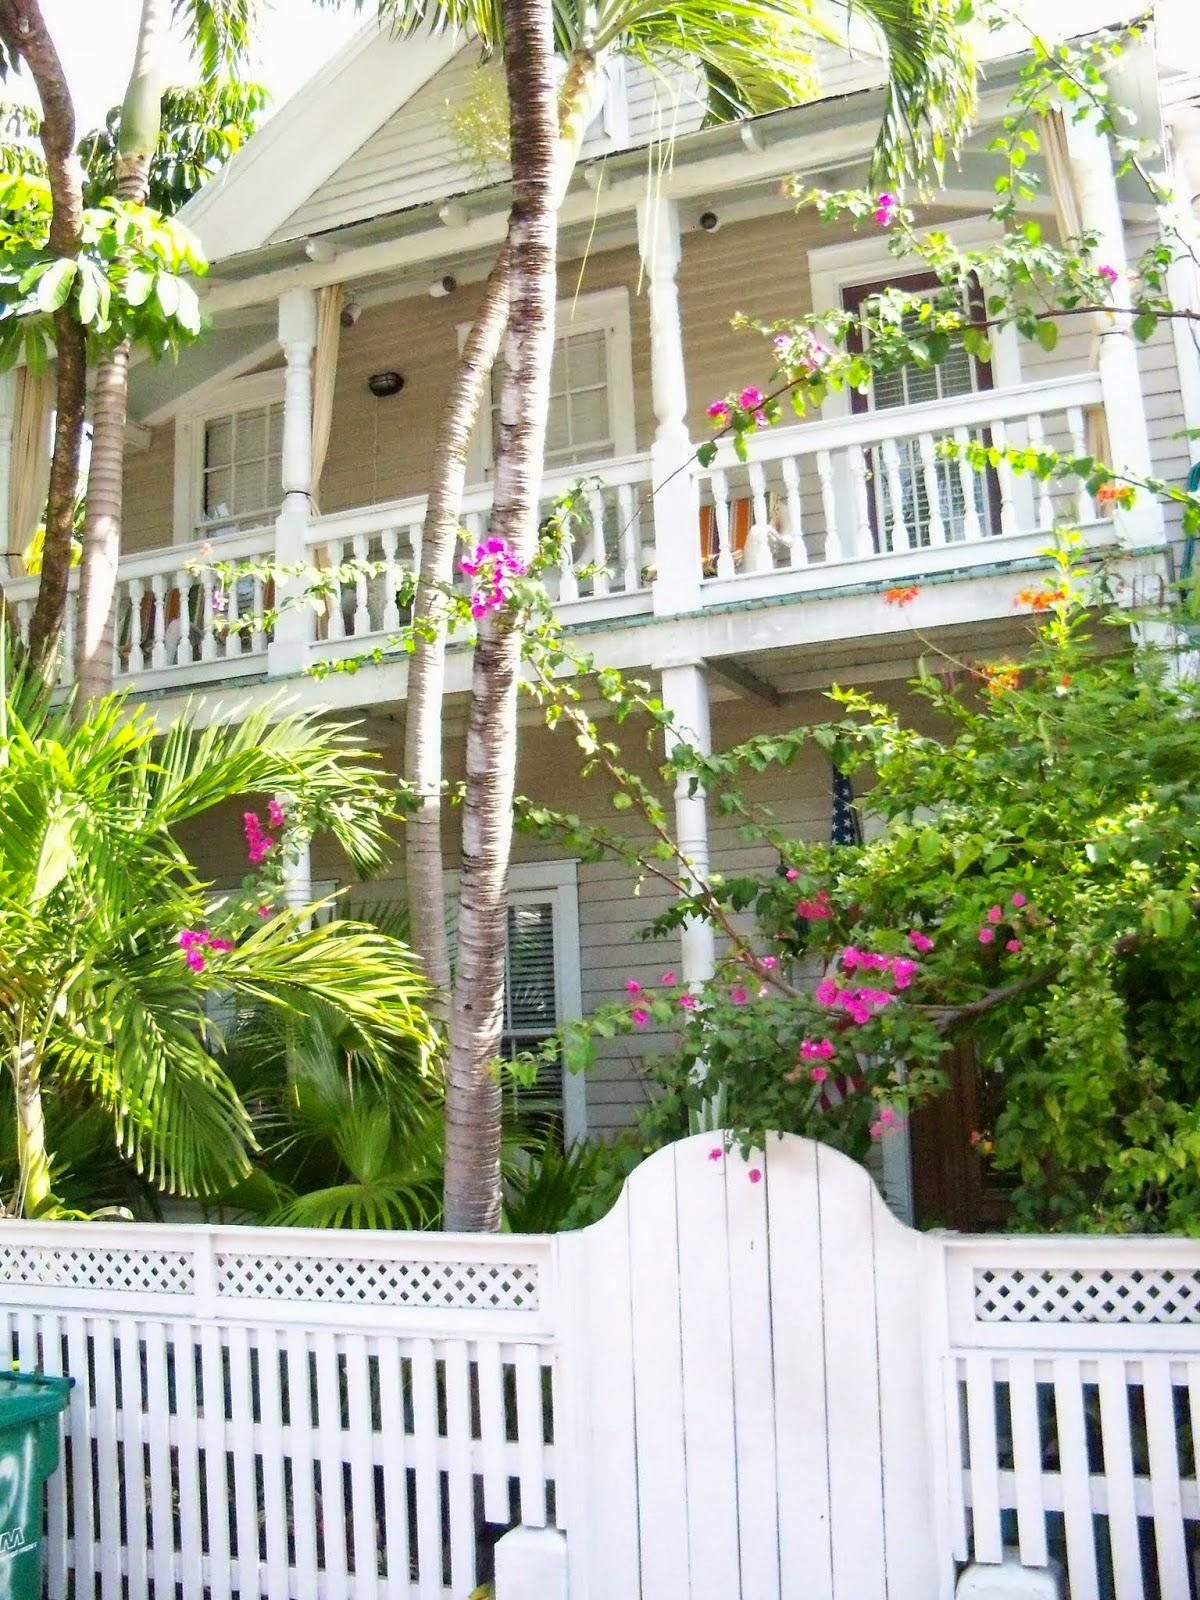 Key West Vacation - 116_5643.JPG